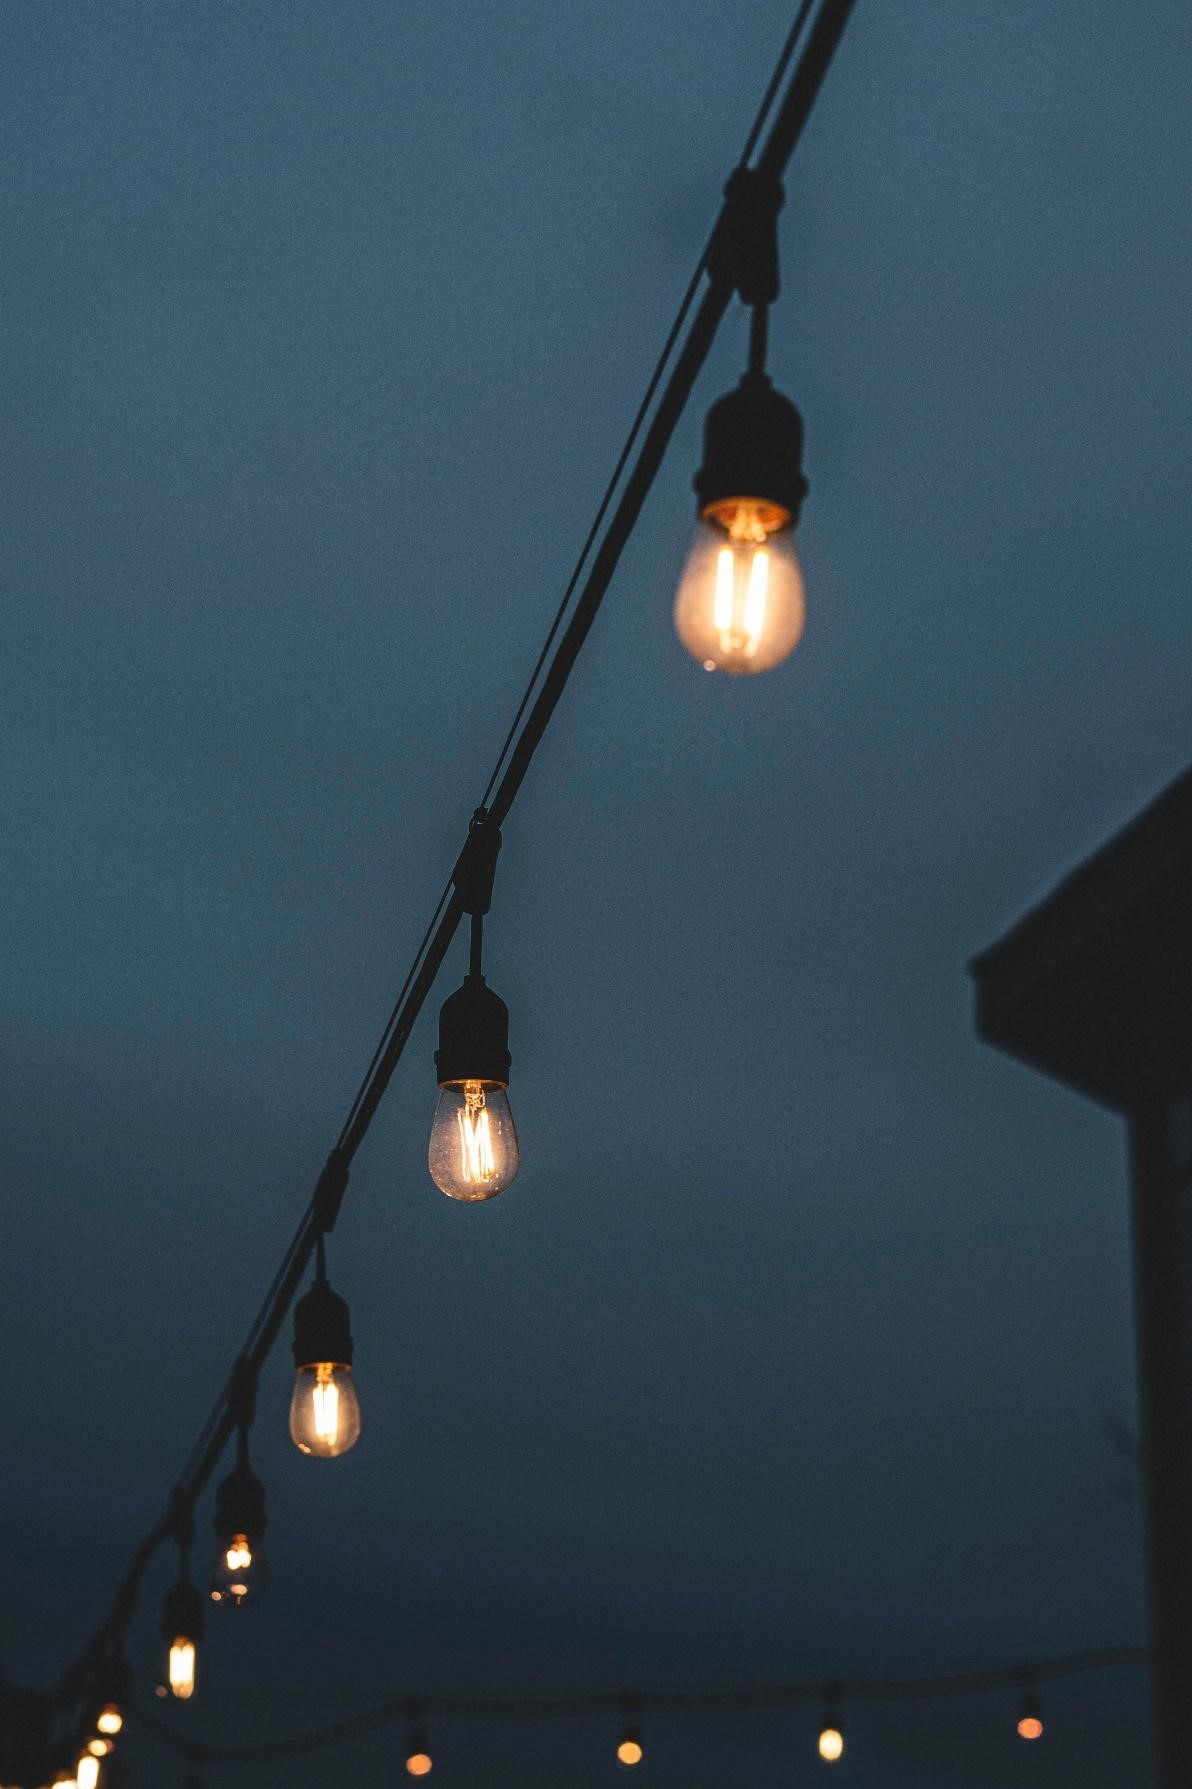 illustration of a string of lanterns